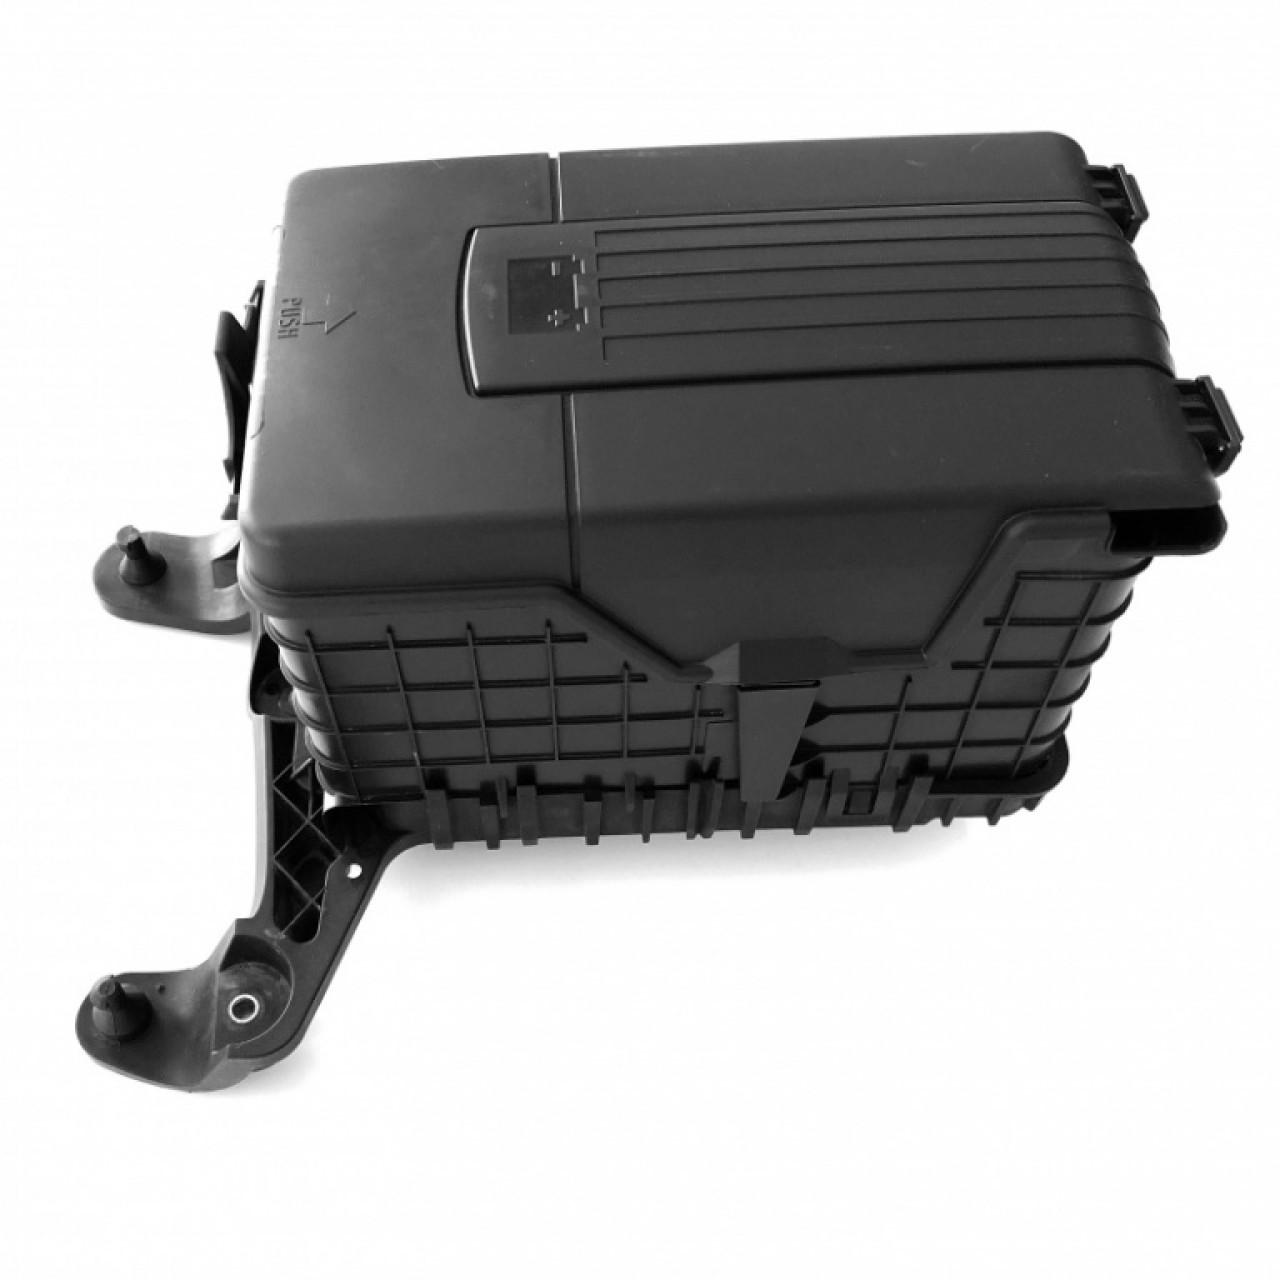 Dezmembrari Suport + Carcasa Acumulator Oe Volkswagen Jetta 3 2005-2010 1K0915333